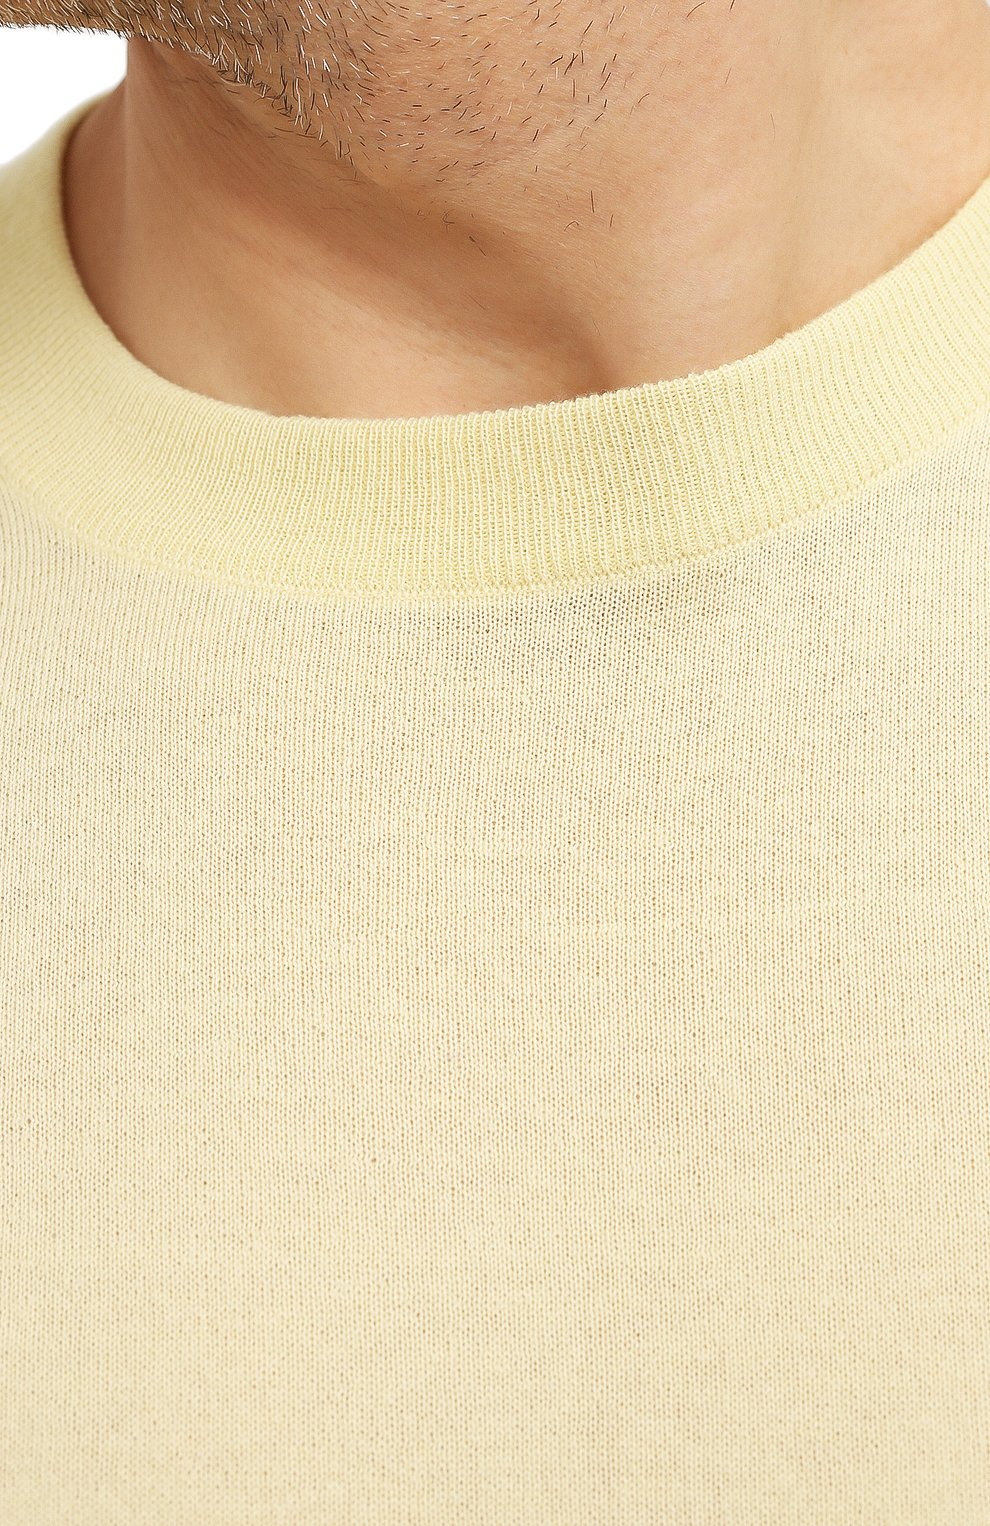 Мужской джемпер из шерсти викуньи LORO PIANA желтого цвета, арт. FAL6624/VVIC   Фото 5